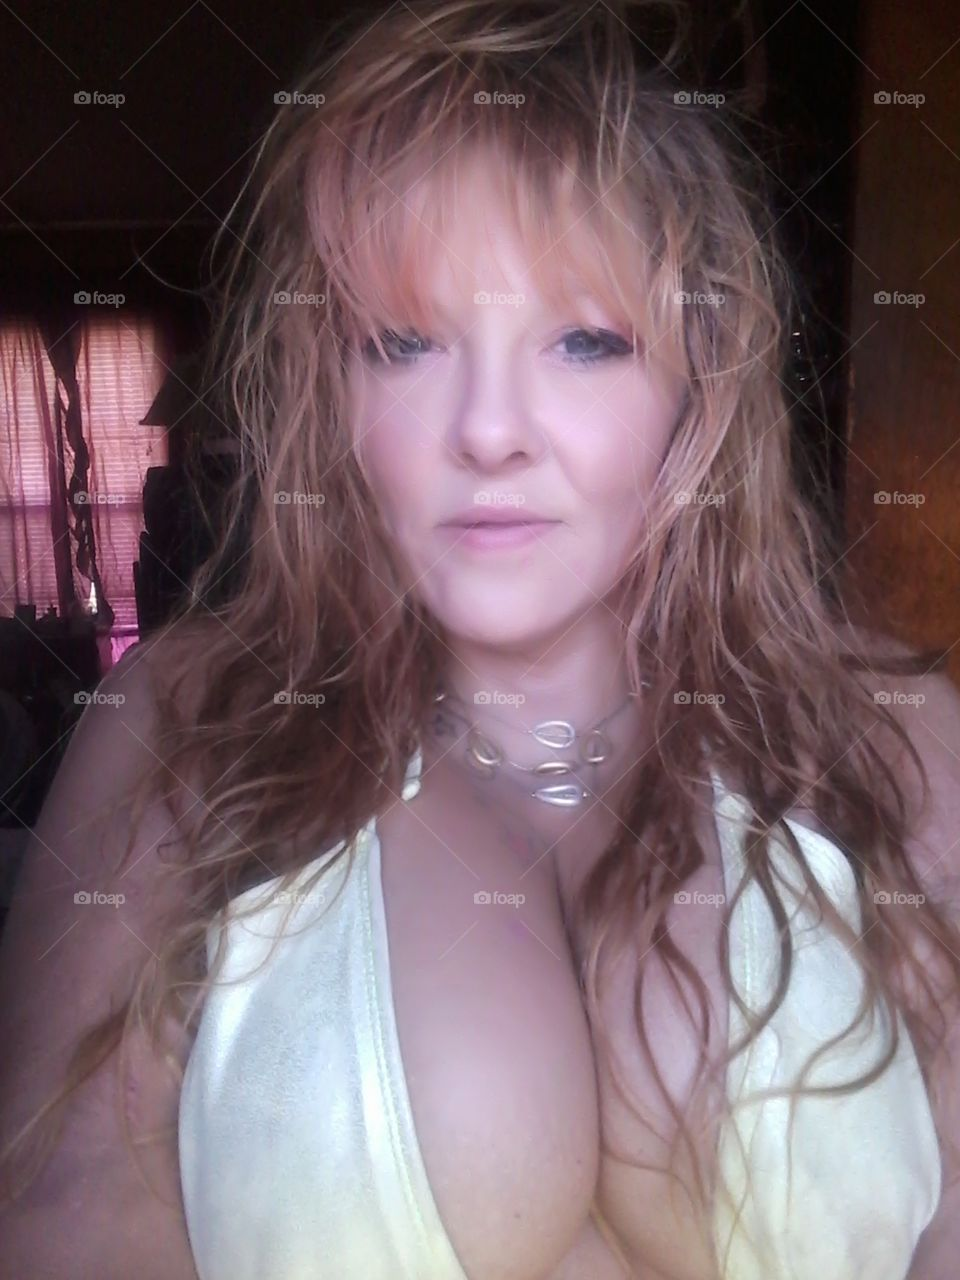 woman seeking male companionship